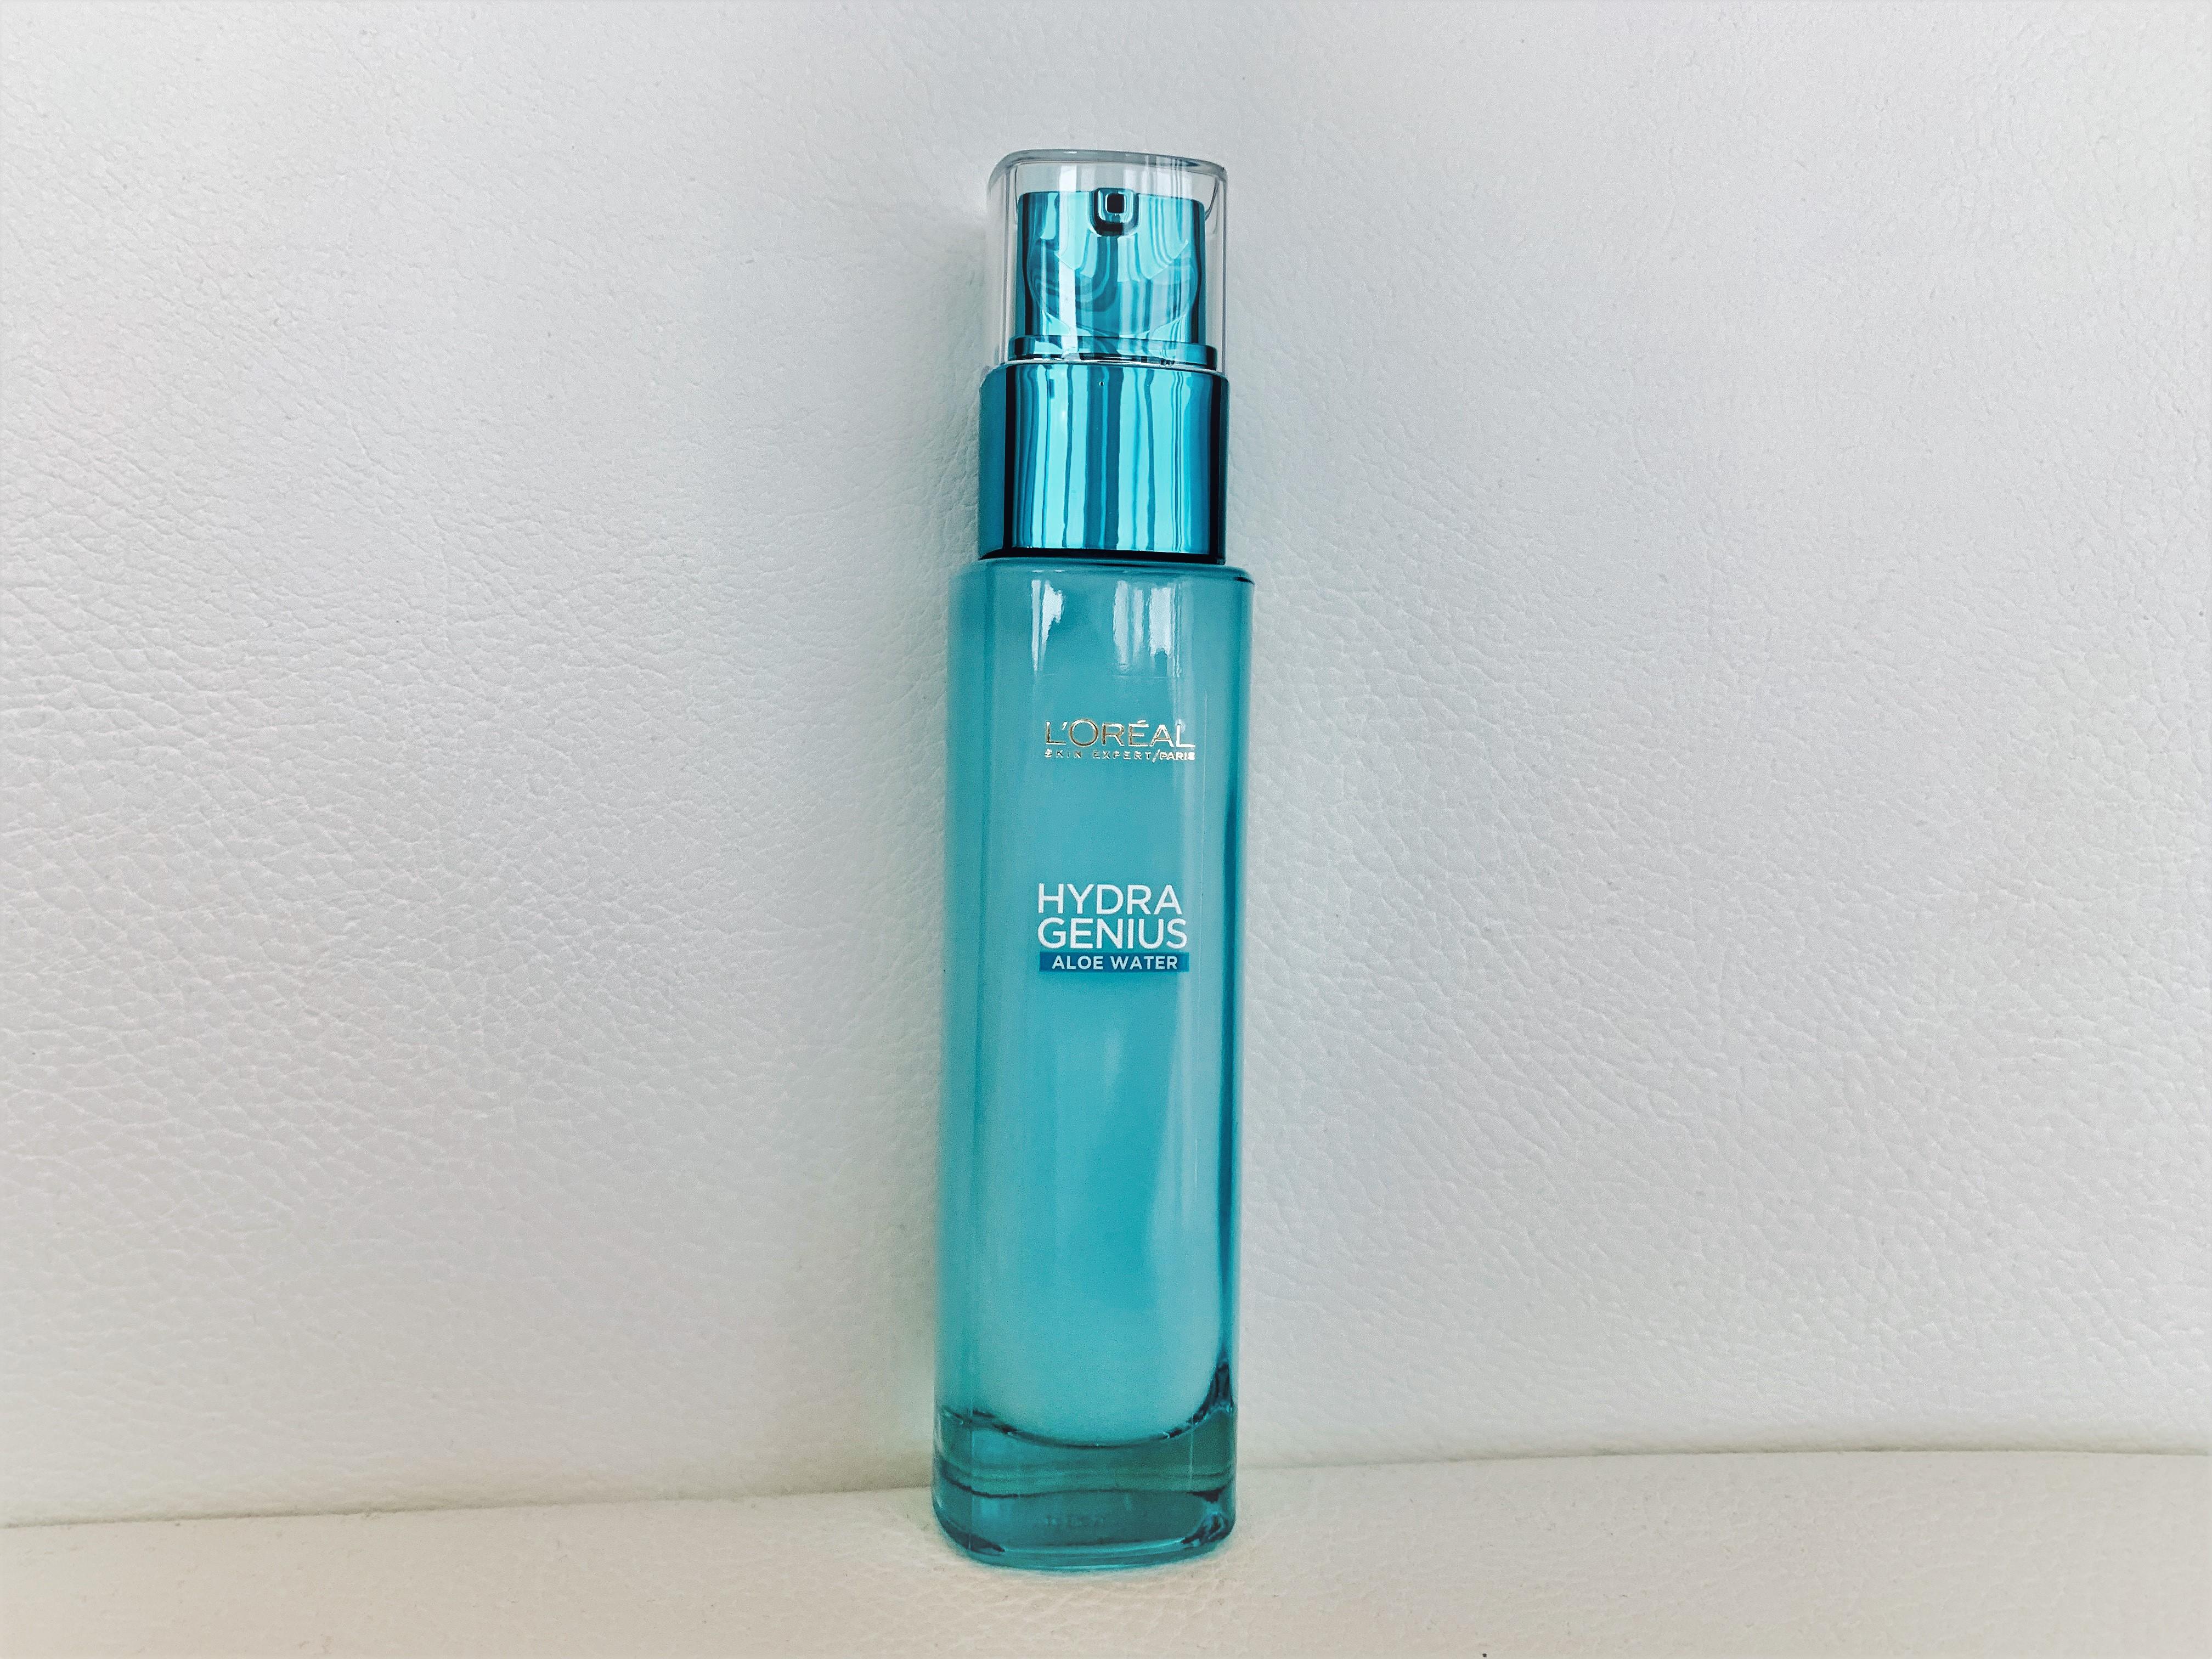 L'Oréal Hydra Genius pleťový fluid